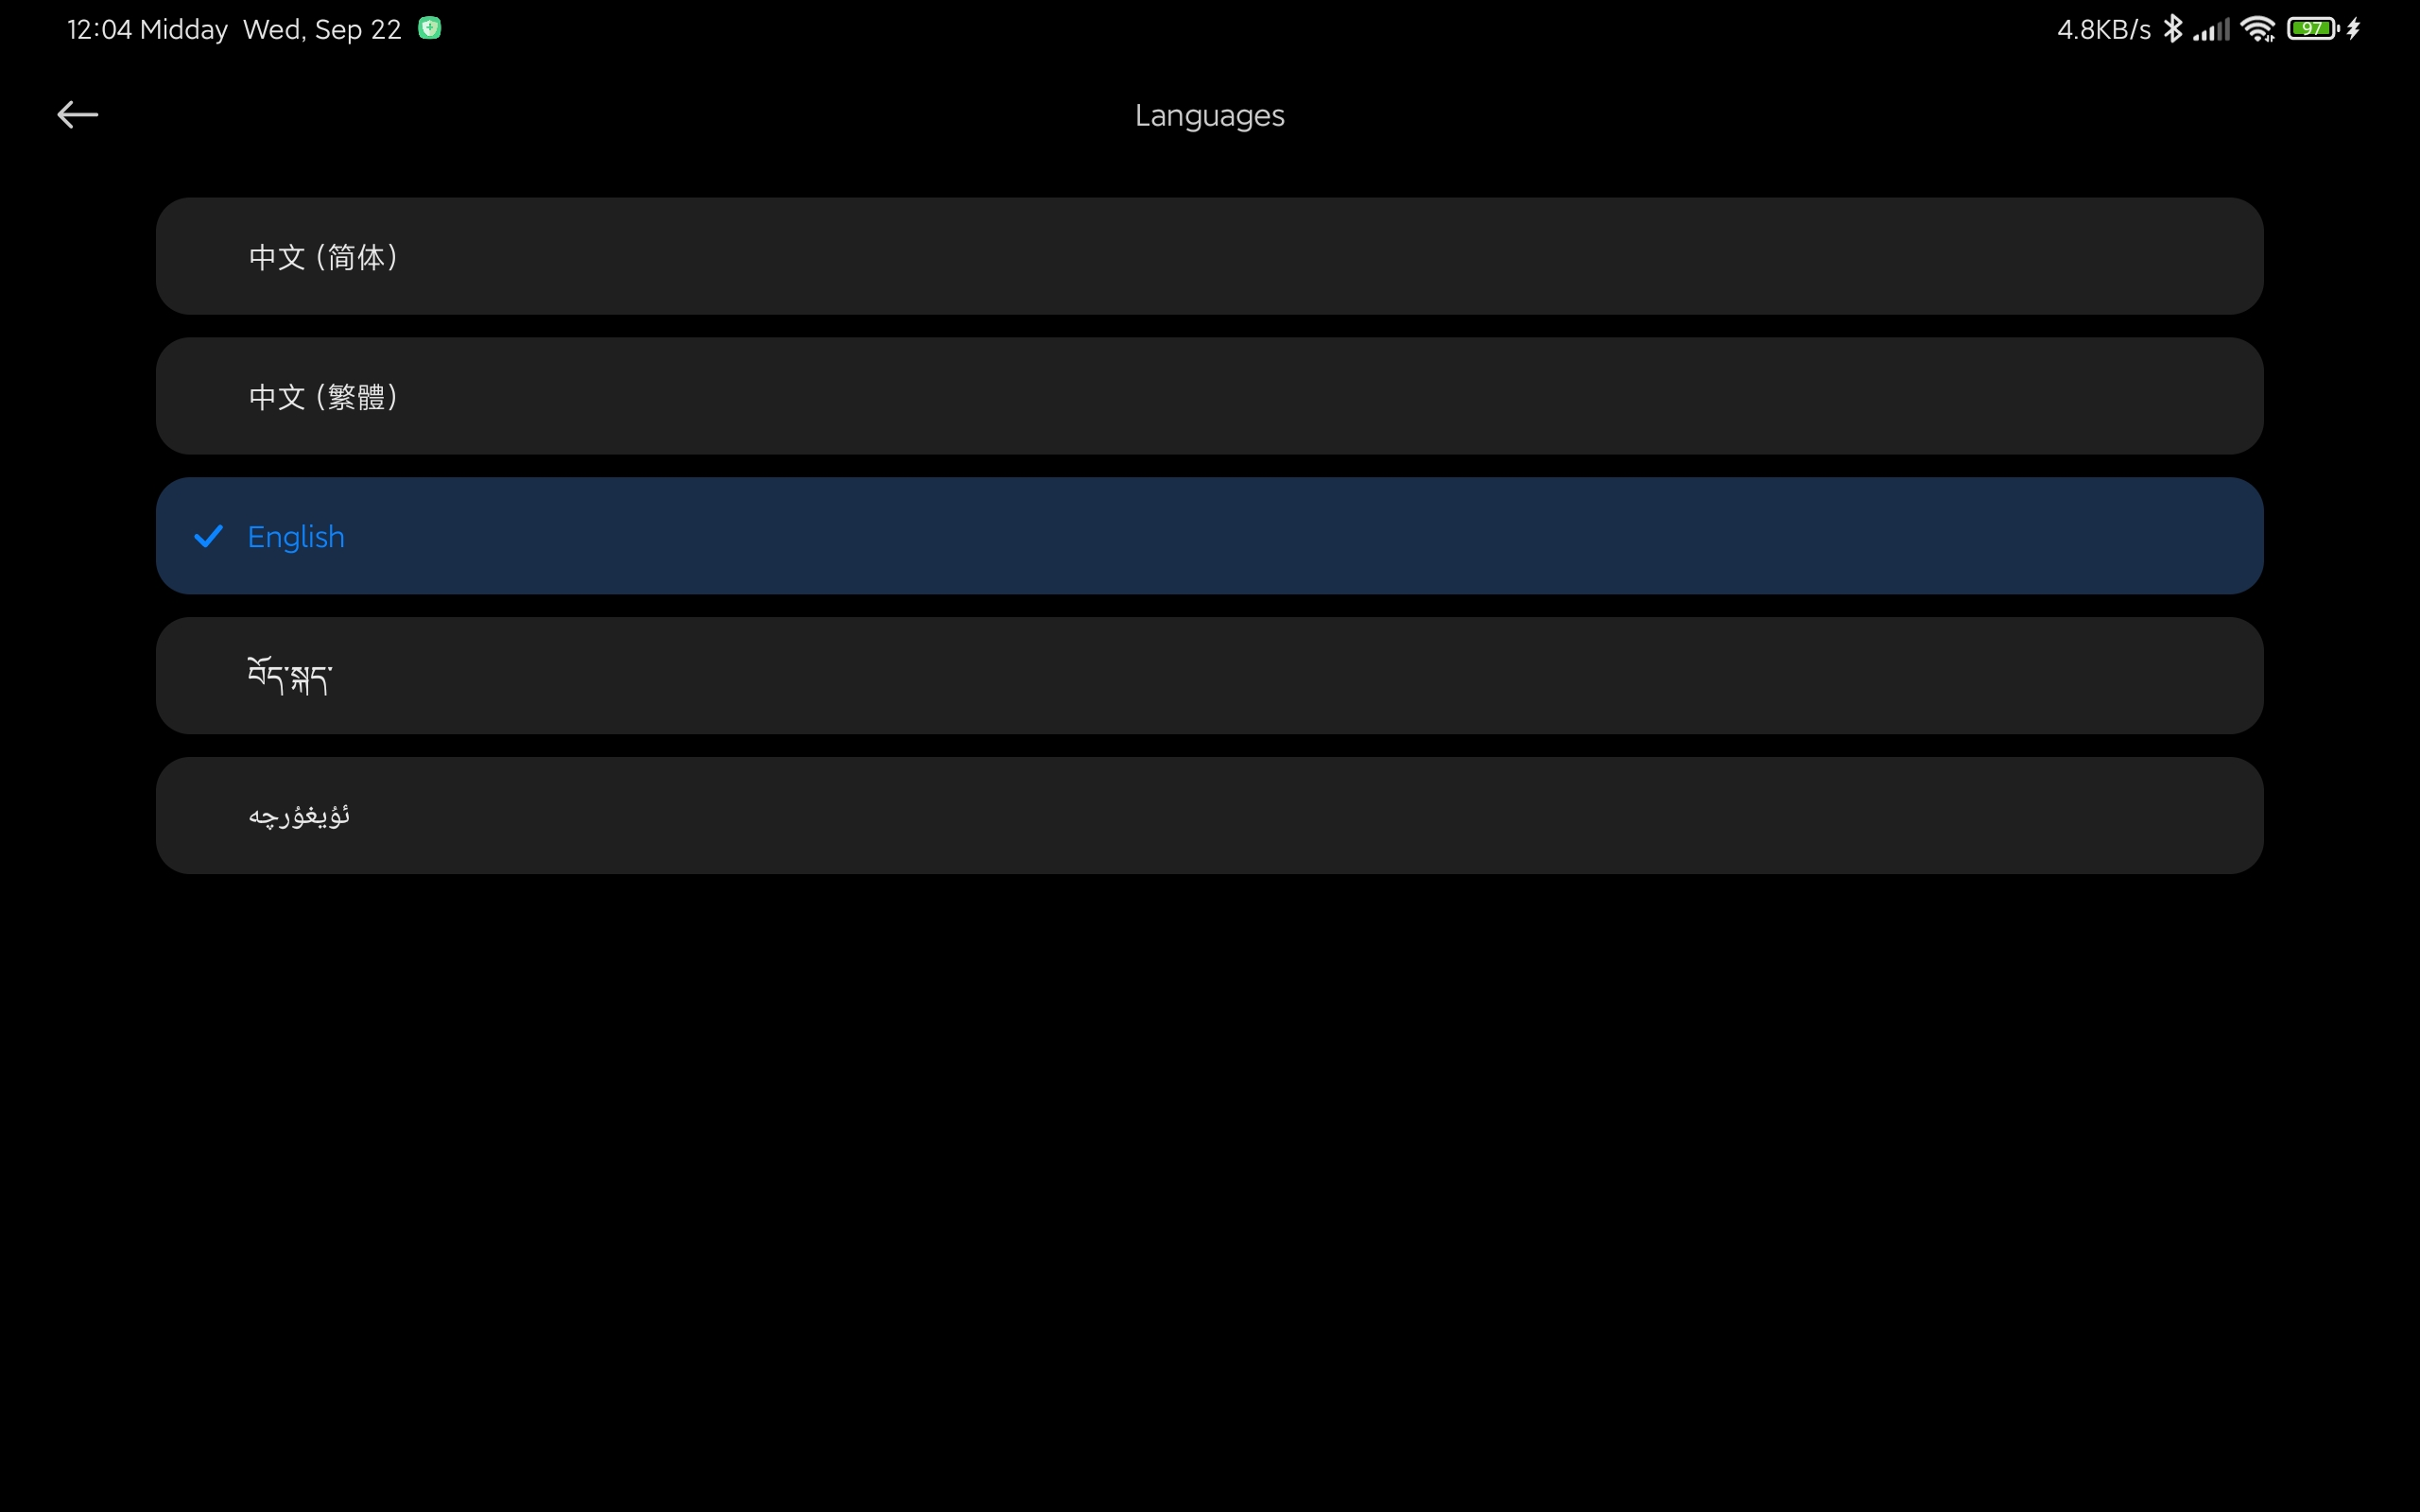 Screenshot_2021-09-22-12-04-13-305_com.android.settings.jpg